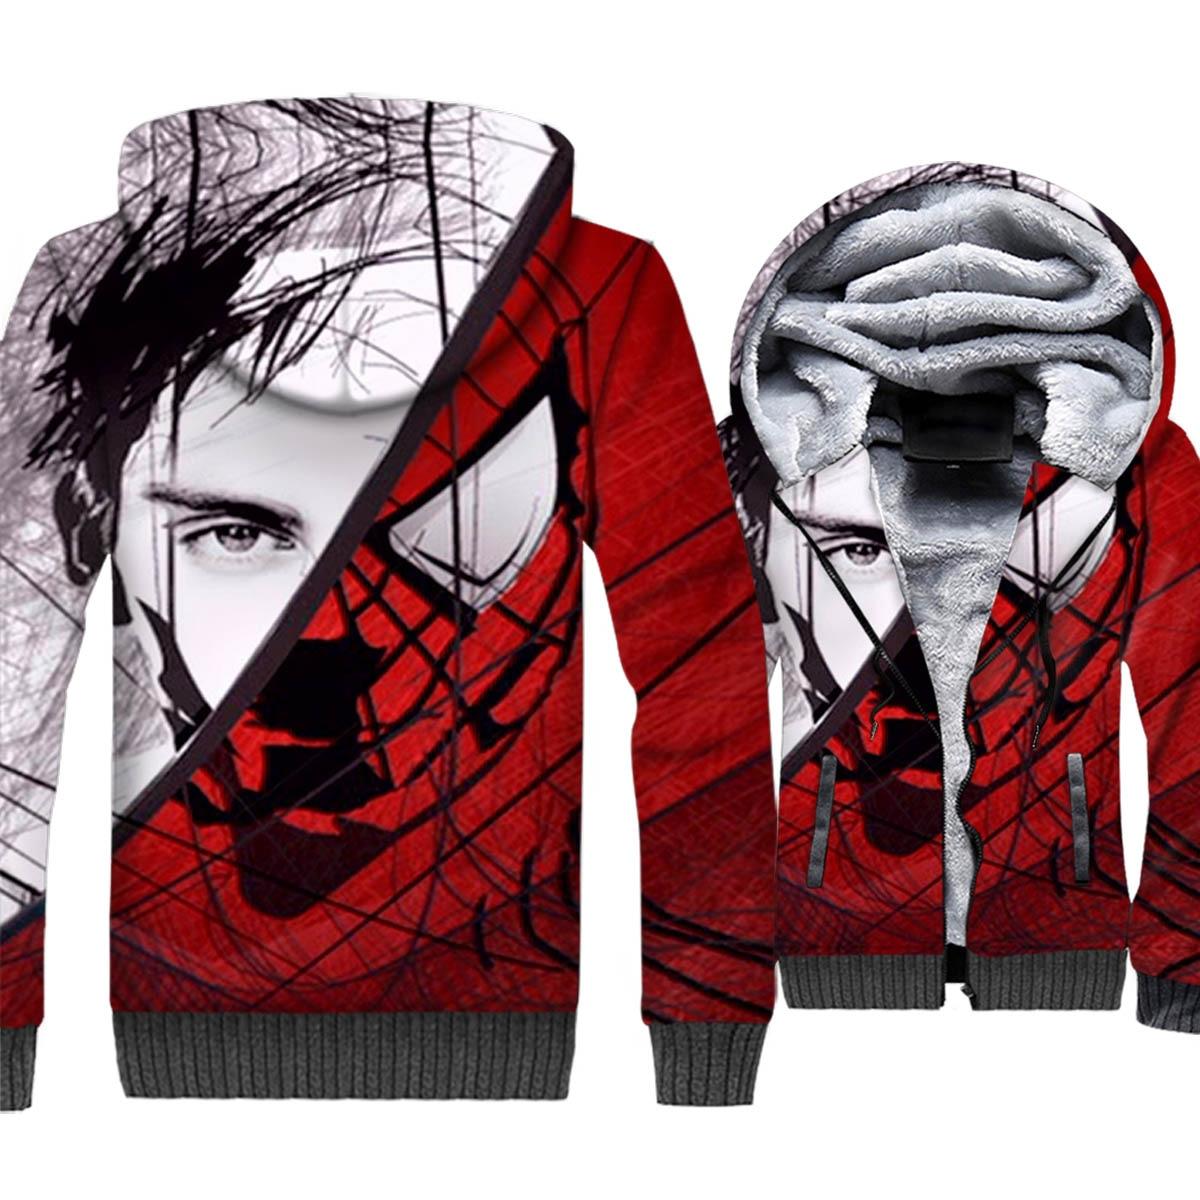 Men's Hoodies 2018 Autumn Winter Fleece Zipper Warm Jacket Punk Streetwear Hooded Hoody 3D Spiderman Sweatshirts For Men Hoddie